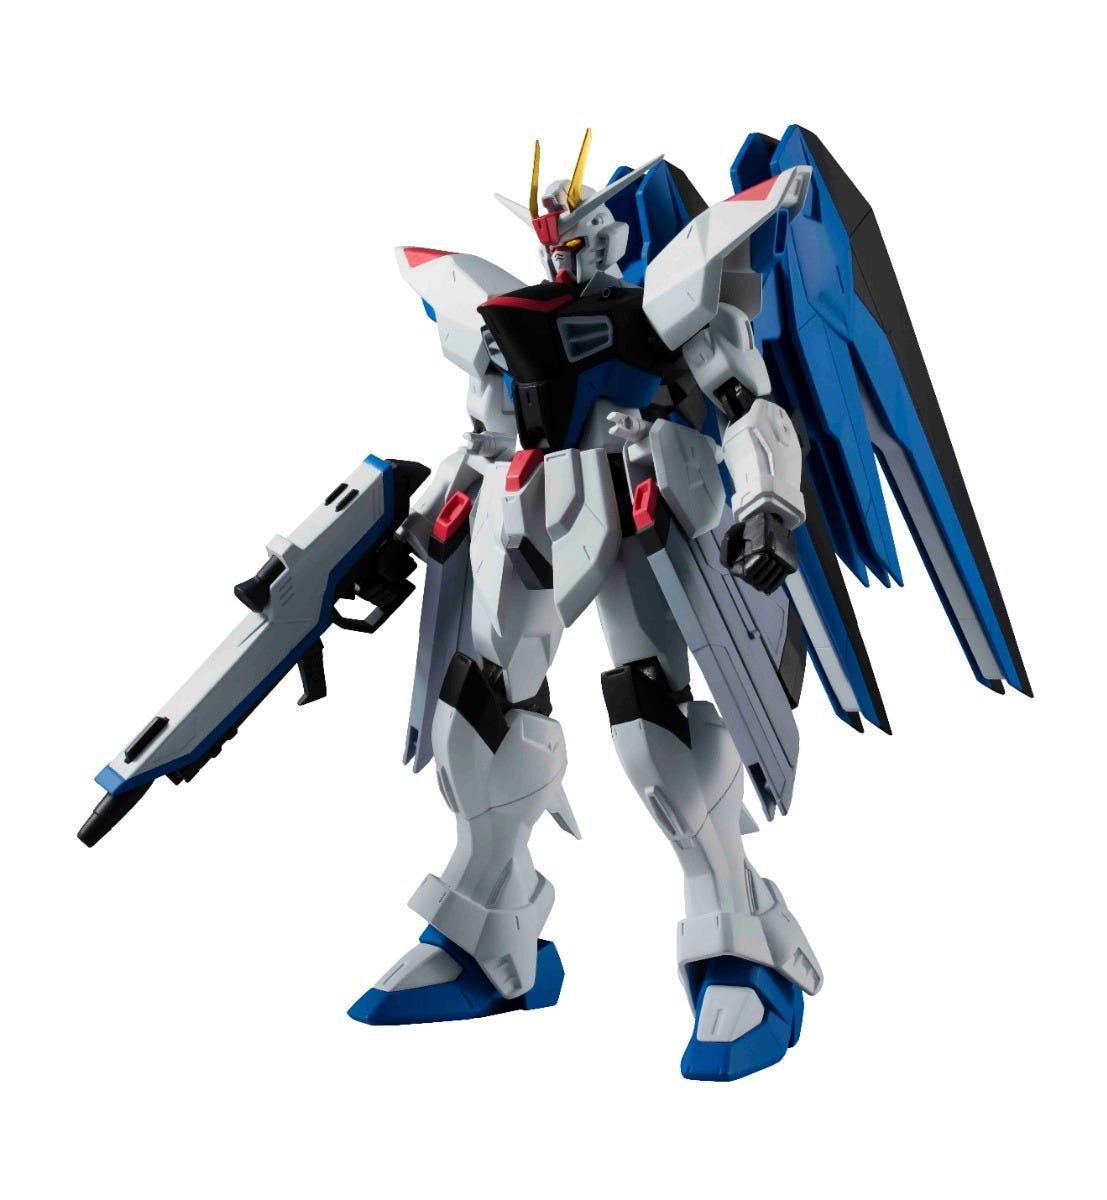 "Bandai Spirits Gundam Universe ZGMF-X10A Freedom Gundam ""Mobile Suit Gundam Seed"", Model Kit"